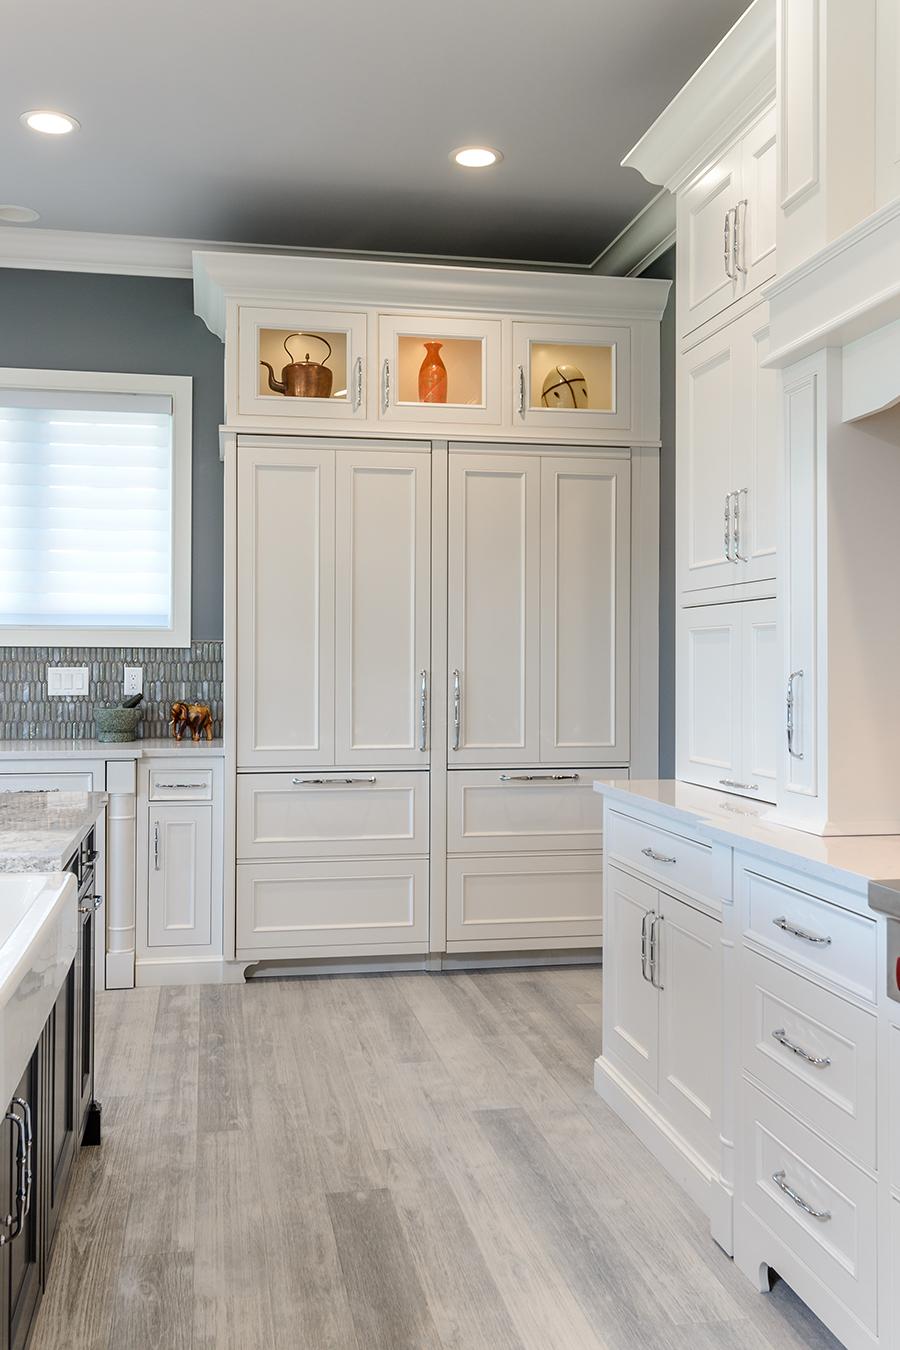 Belle Kitchen Interior Design Designer Luxury Minnesota MN Mpls Minneapolis St Paul Twin Cities10.jpg